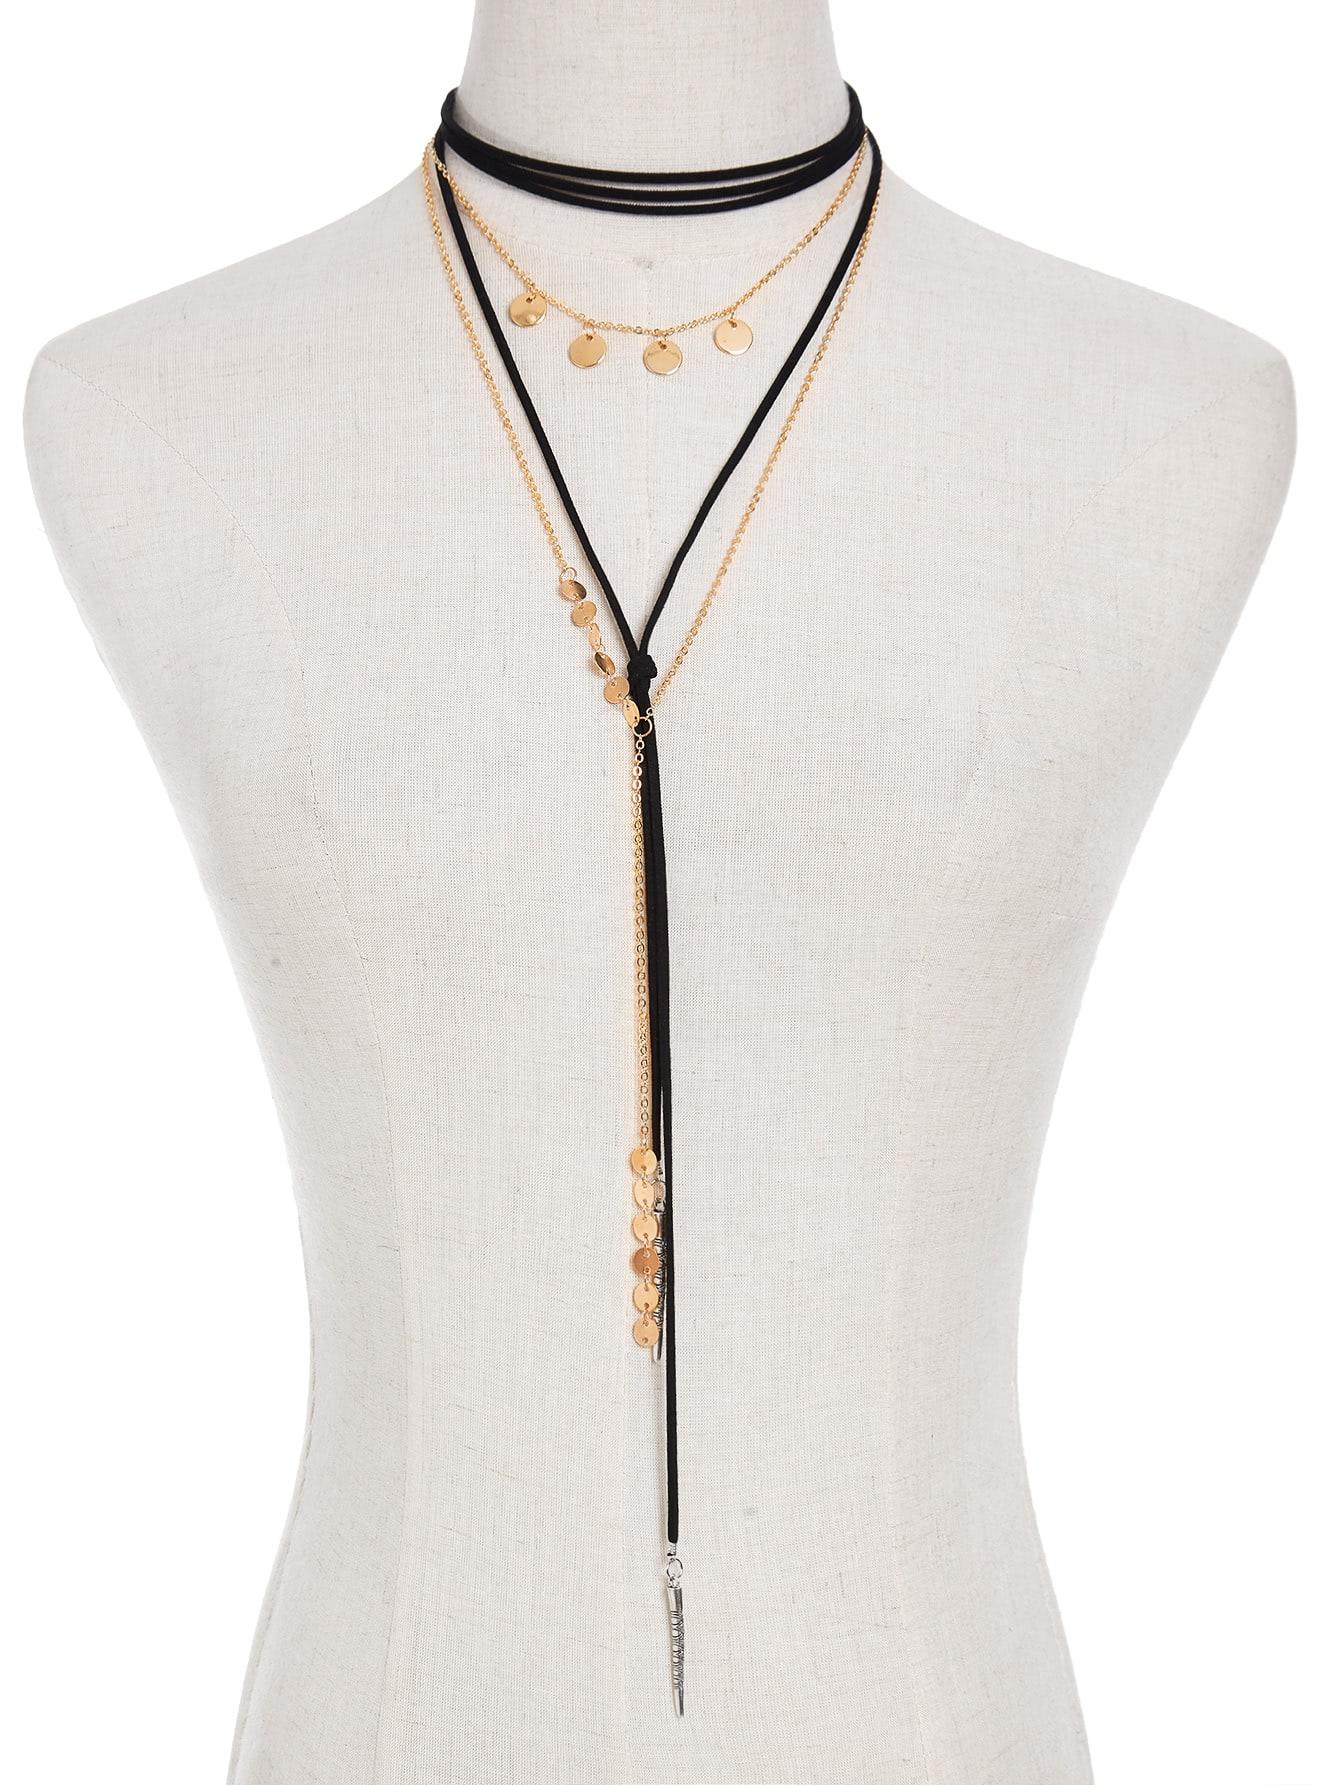 все цены на Sequin & Bar Detail Y Chain Necklace